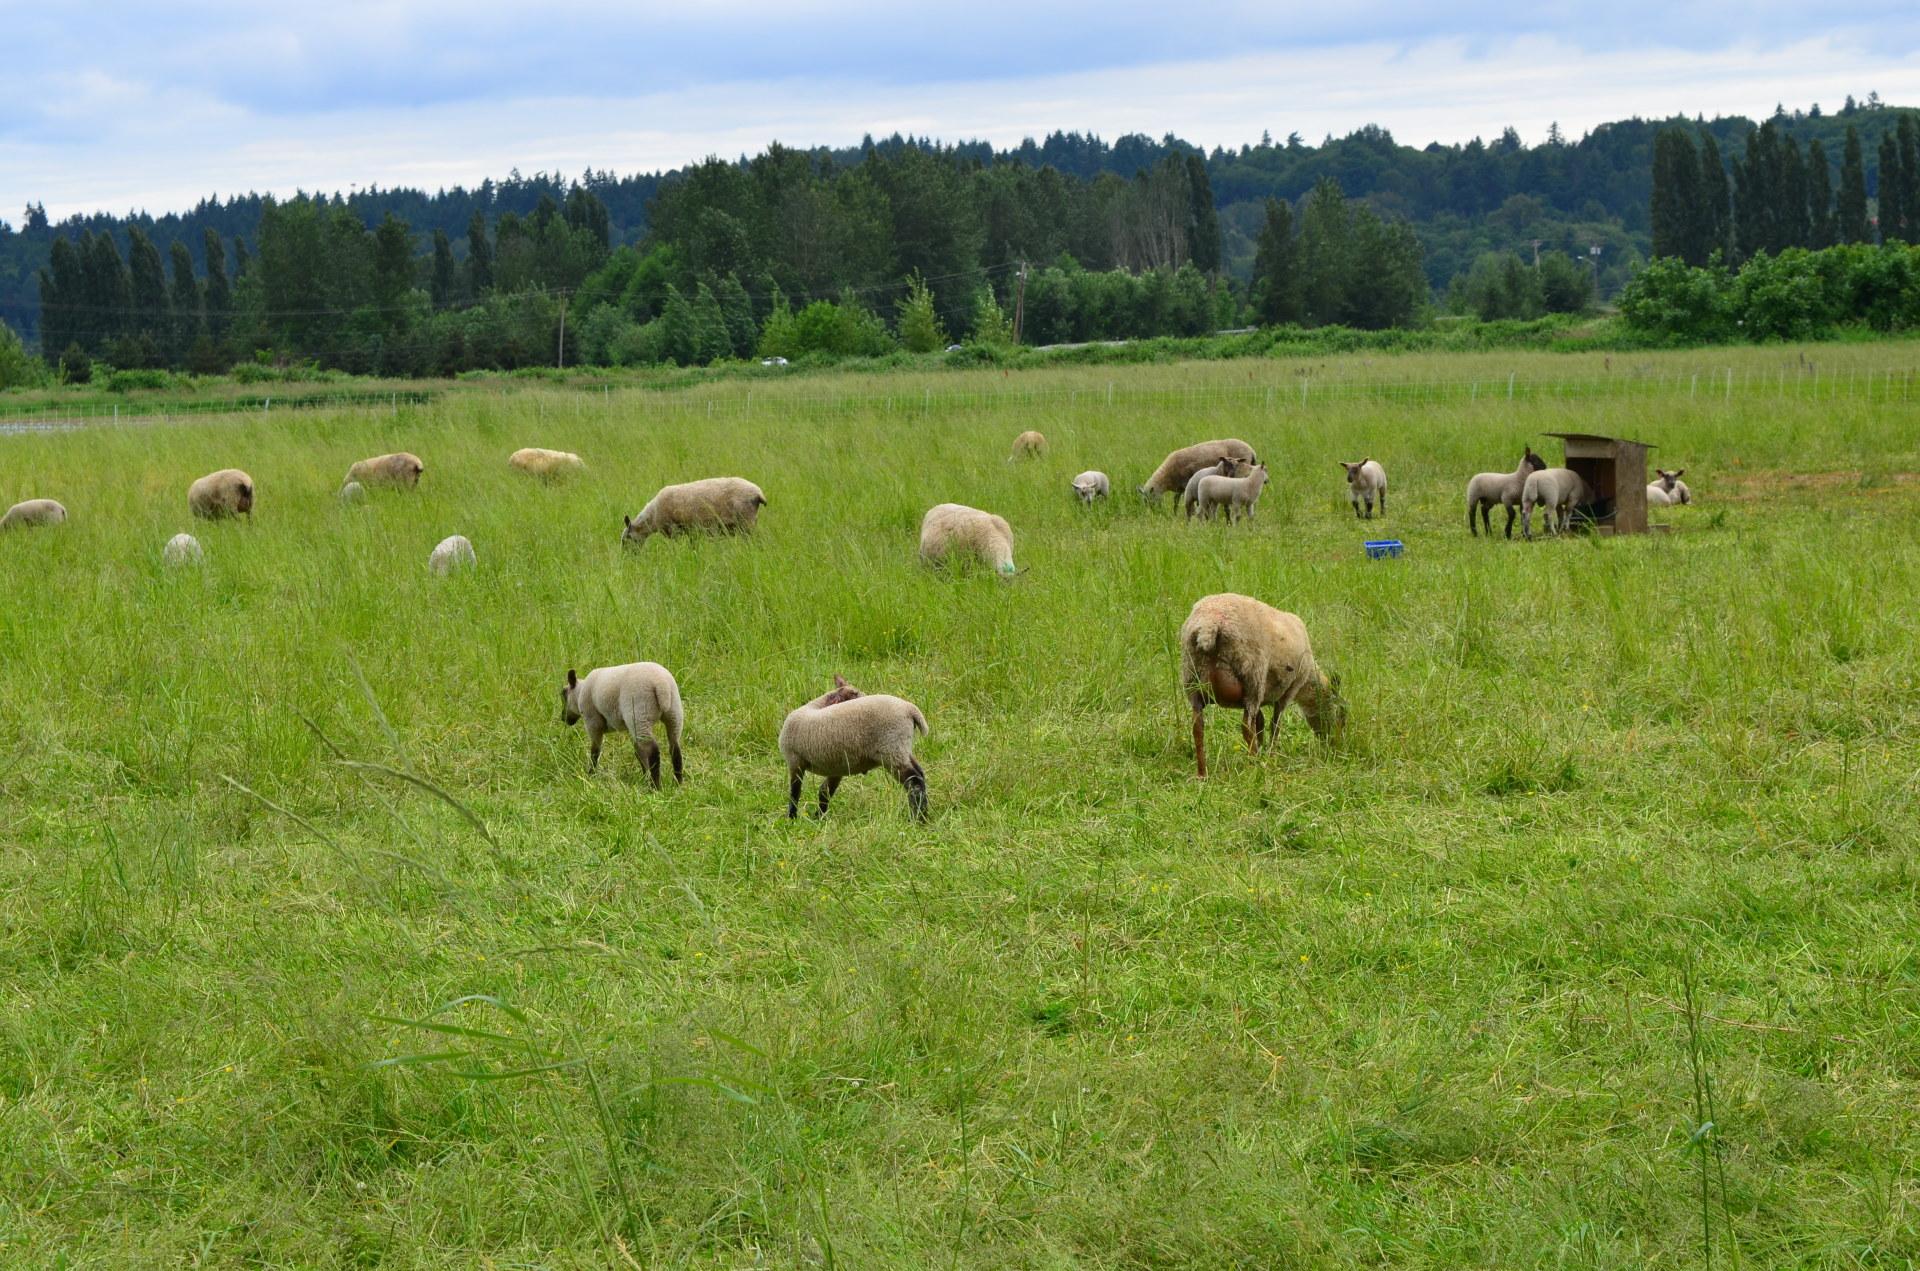 Aspen Hollow Snoqualmie Valley Lamb